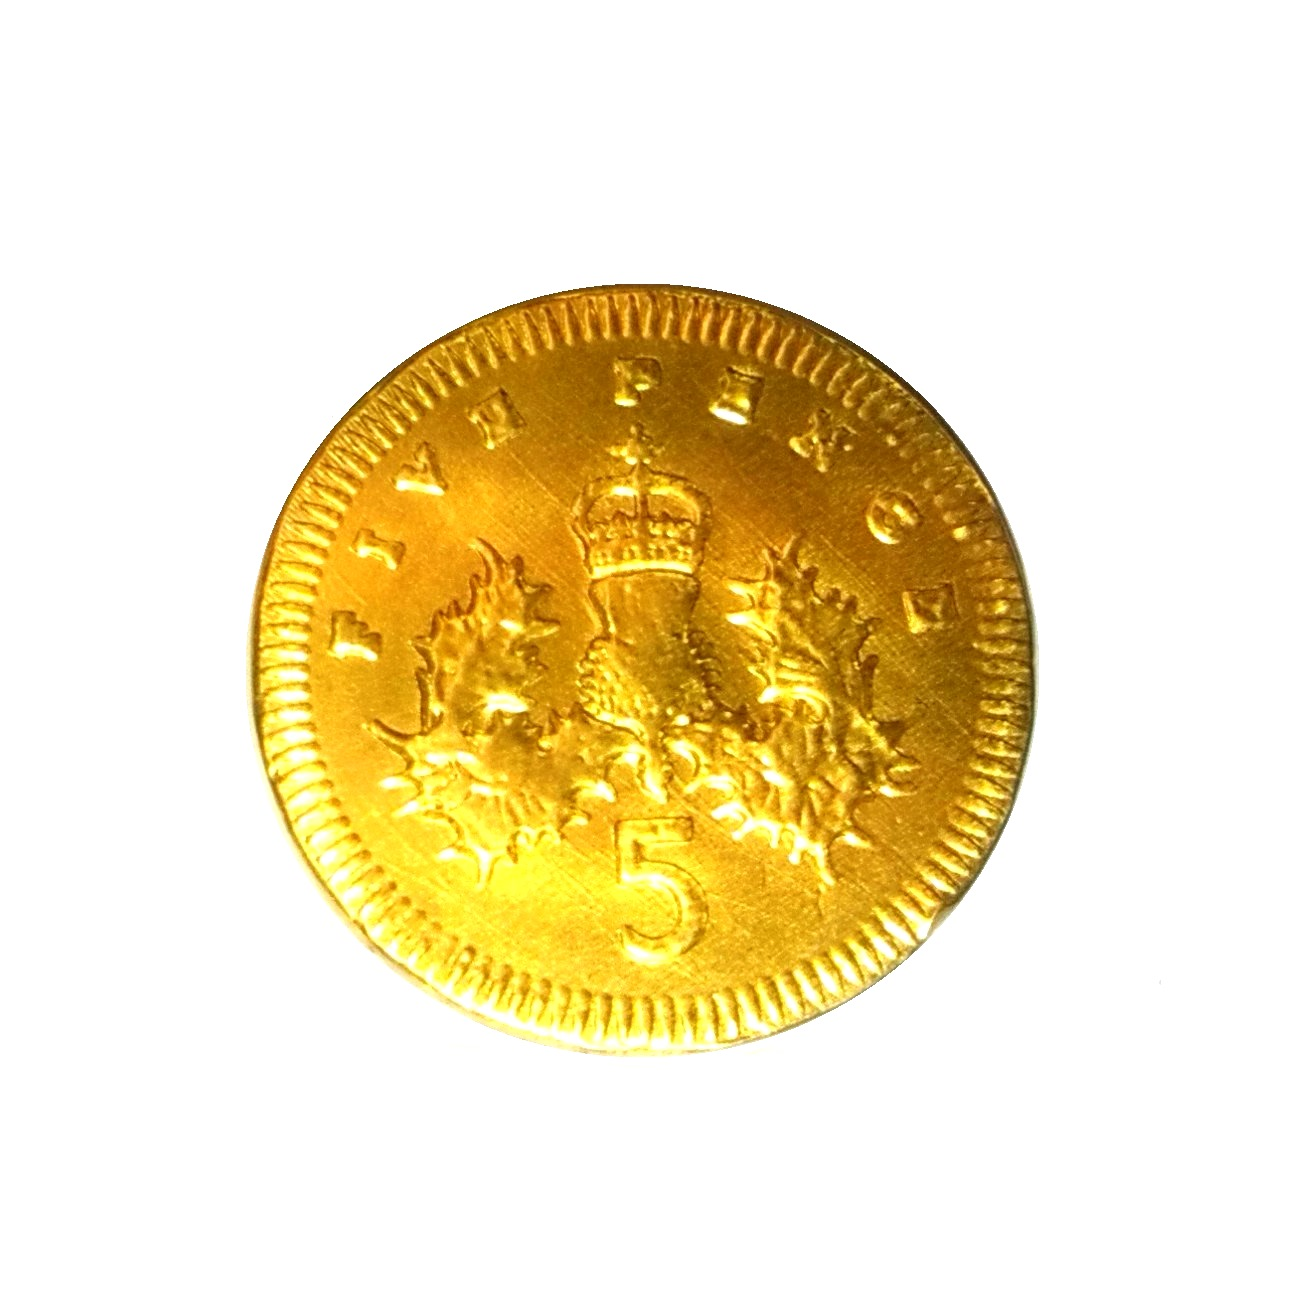 x Gold Foil - Milk Chocolate Money 5p British Coins